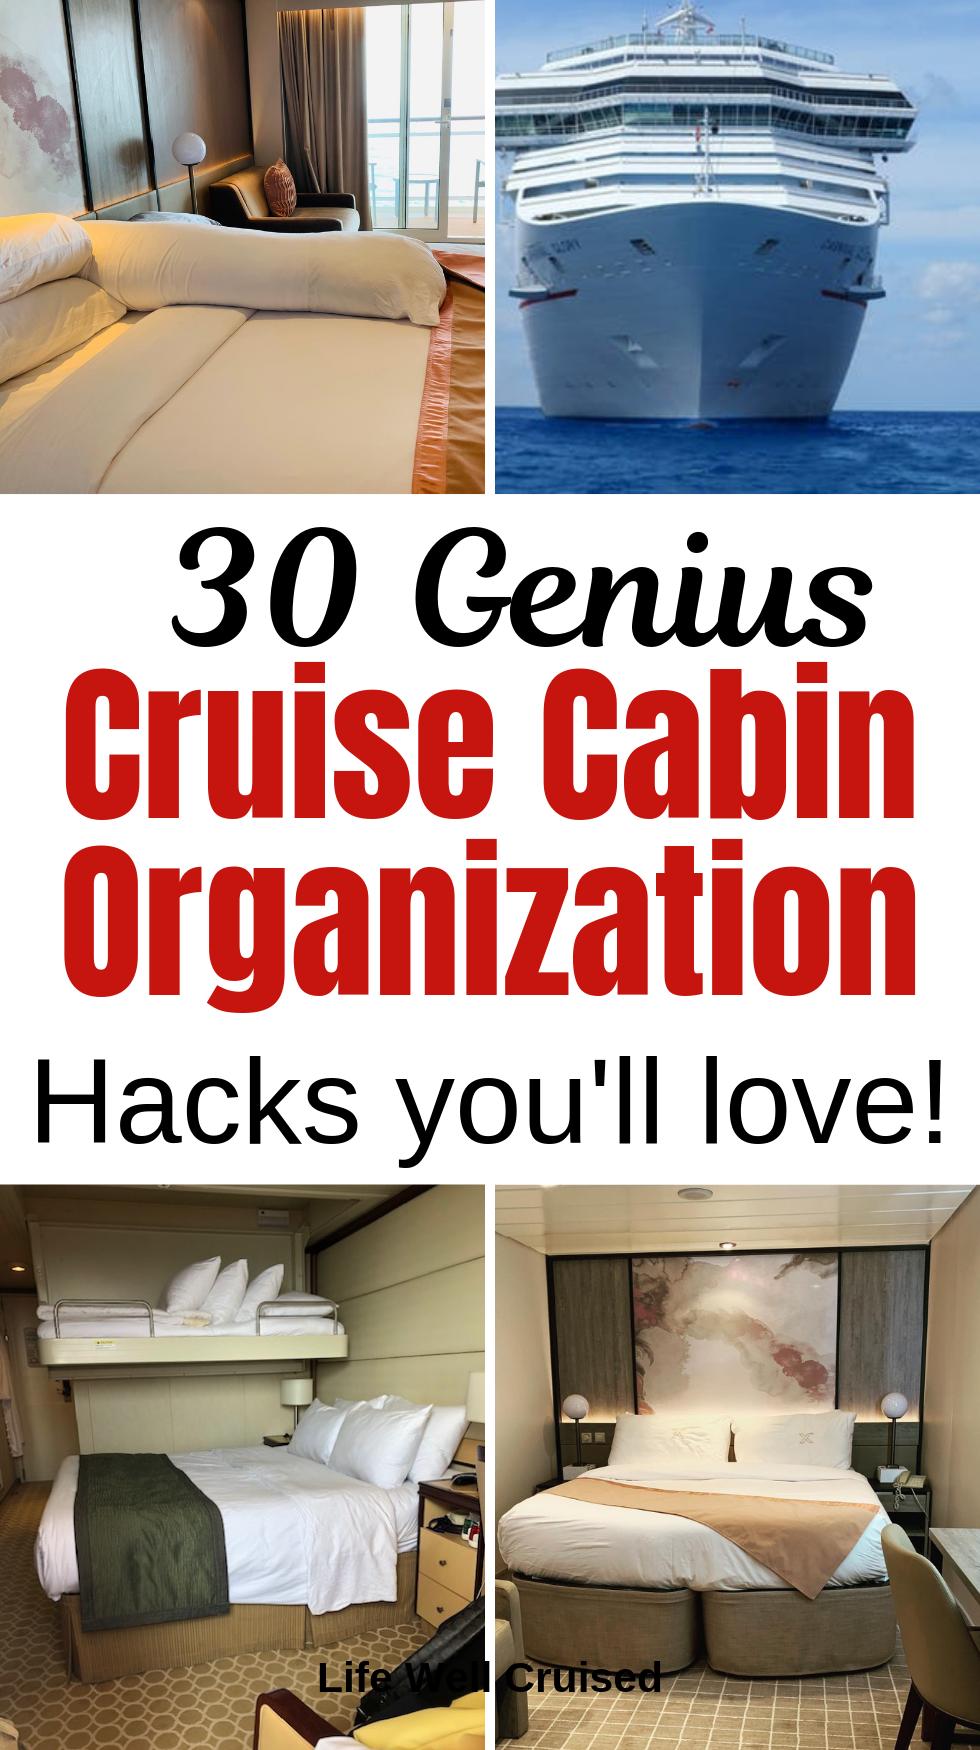 30 Genius Cruise Organization Hacks You'll Love!